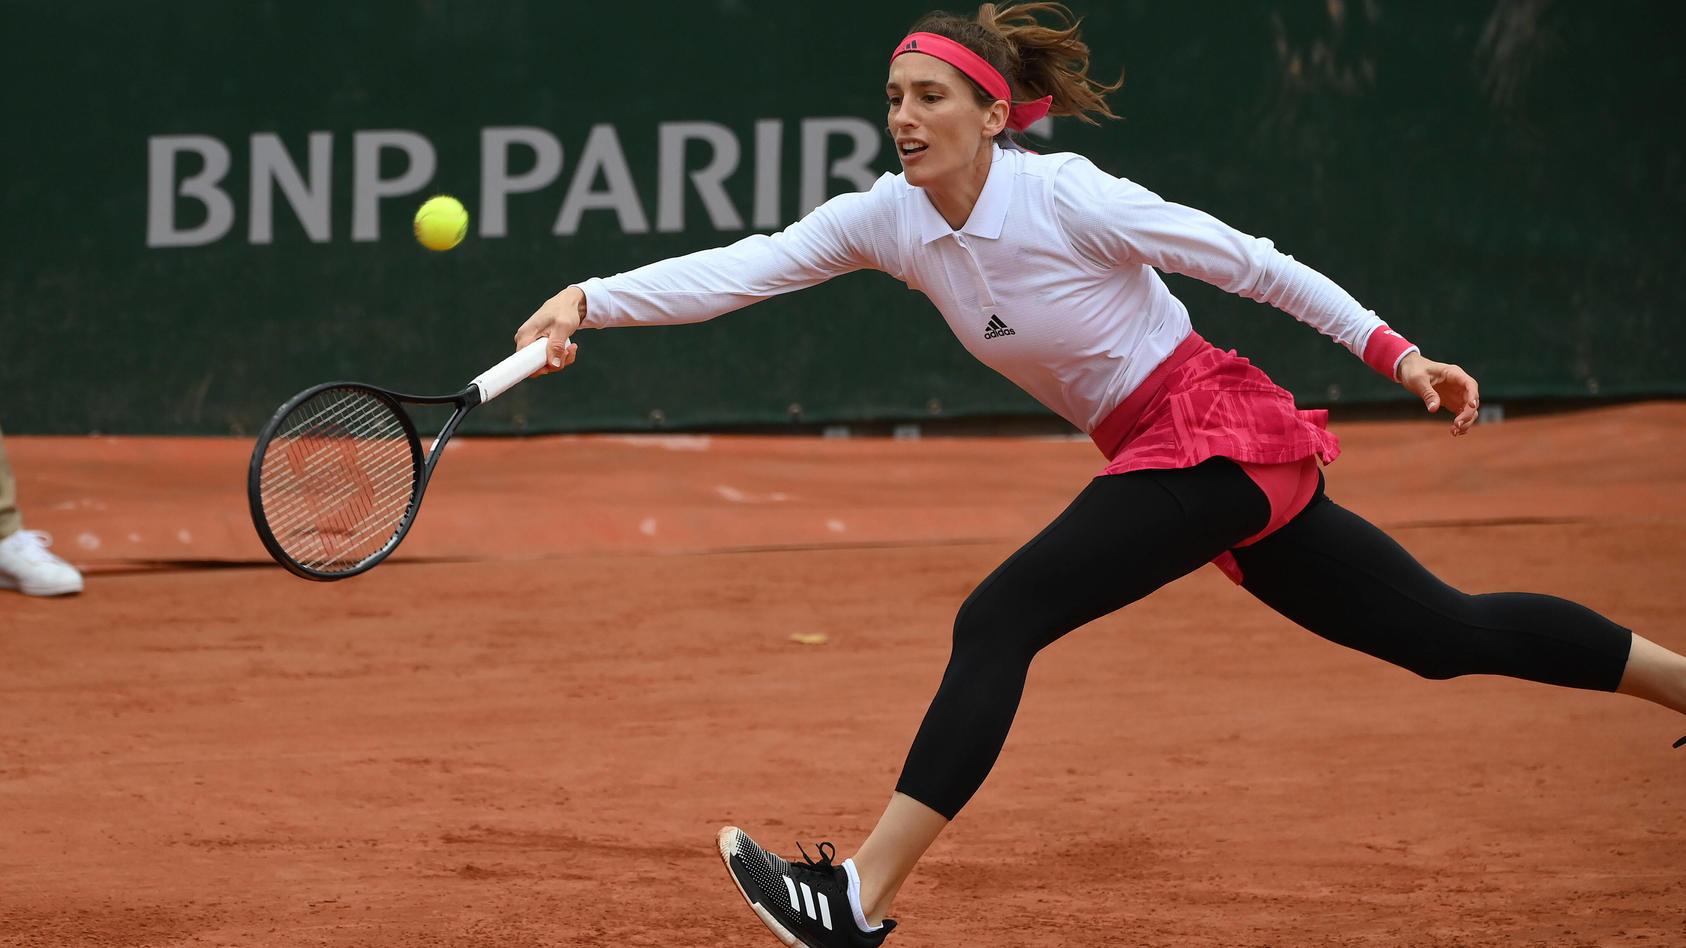 Andrea Petkovic verliert in Runde 1 der French Open